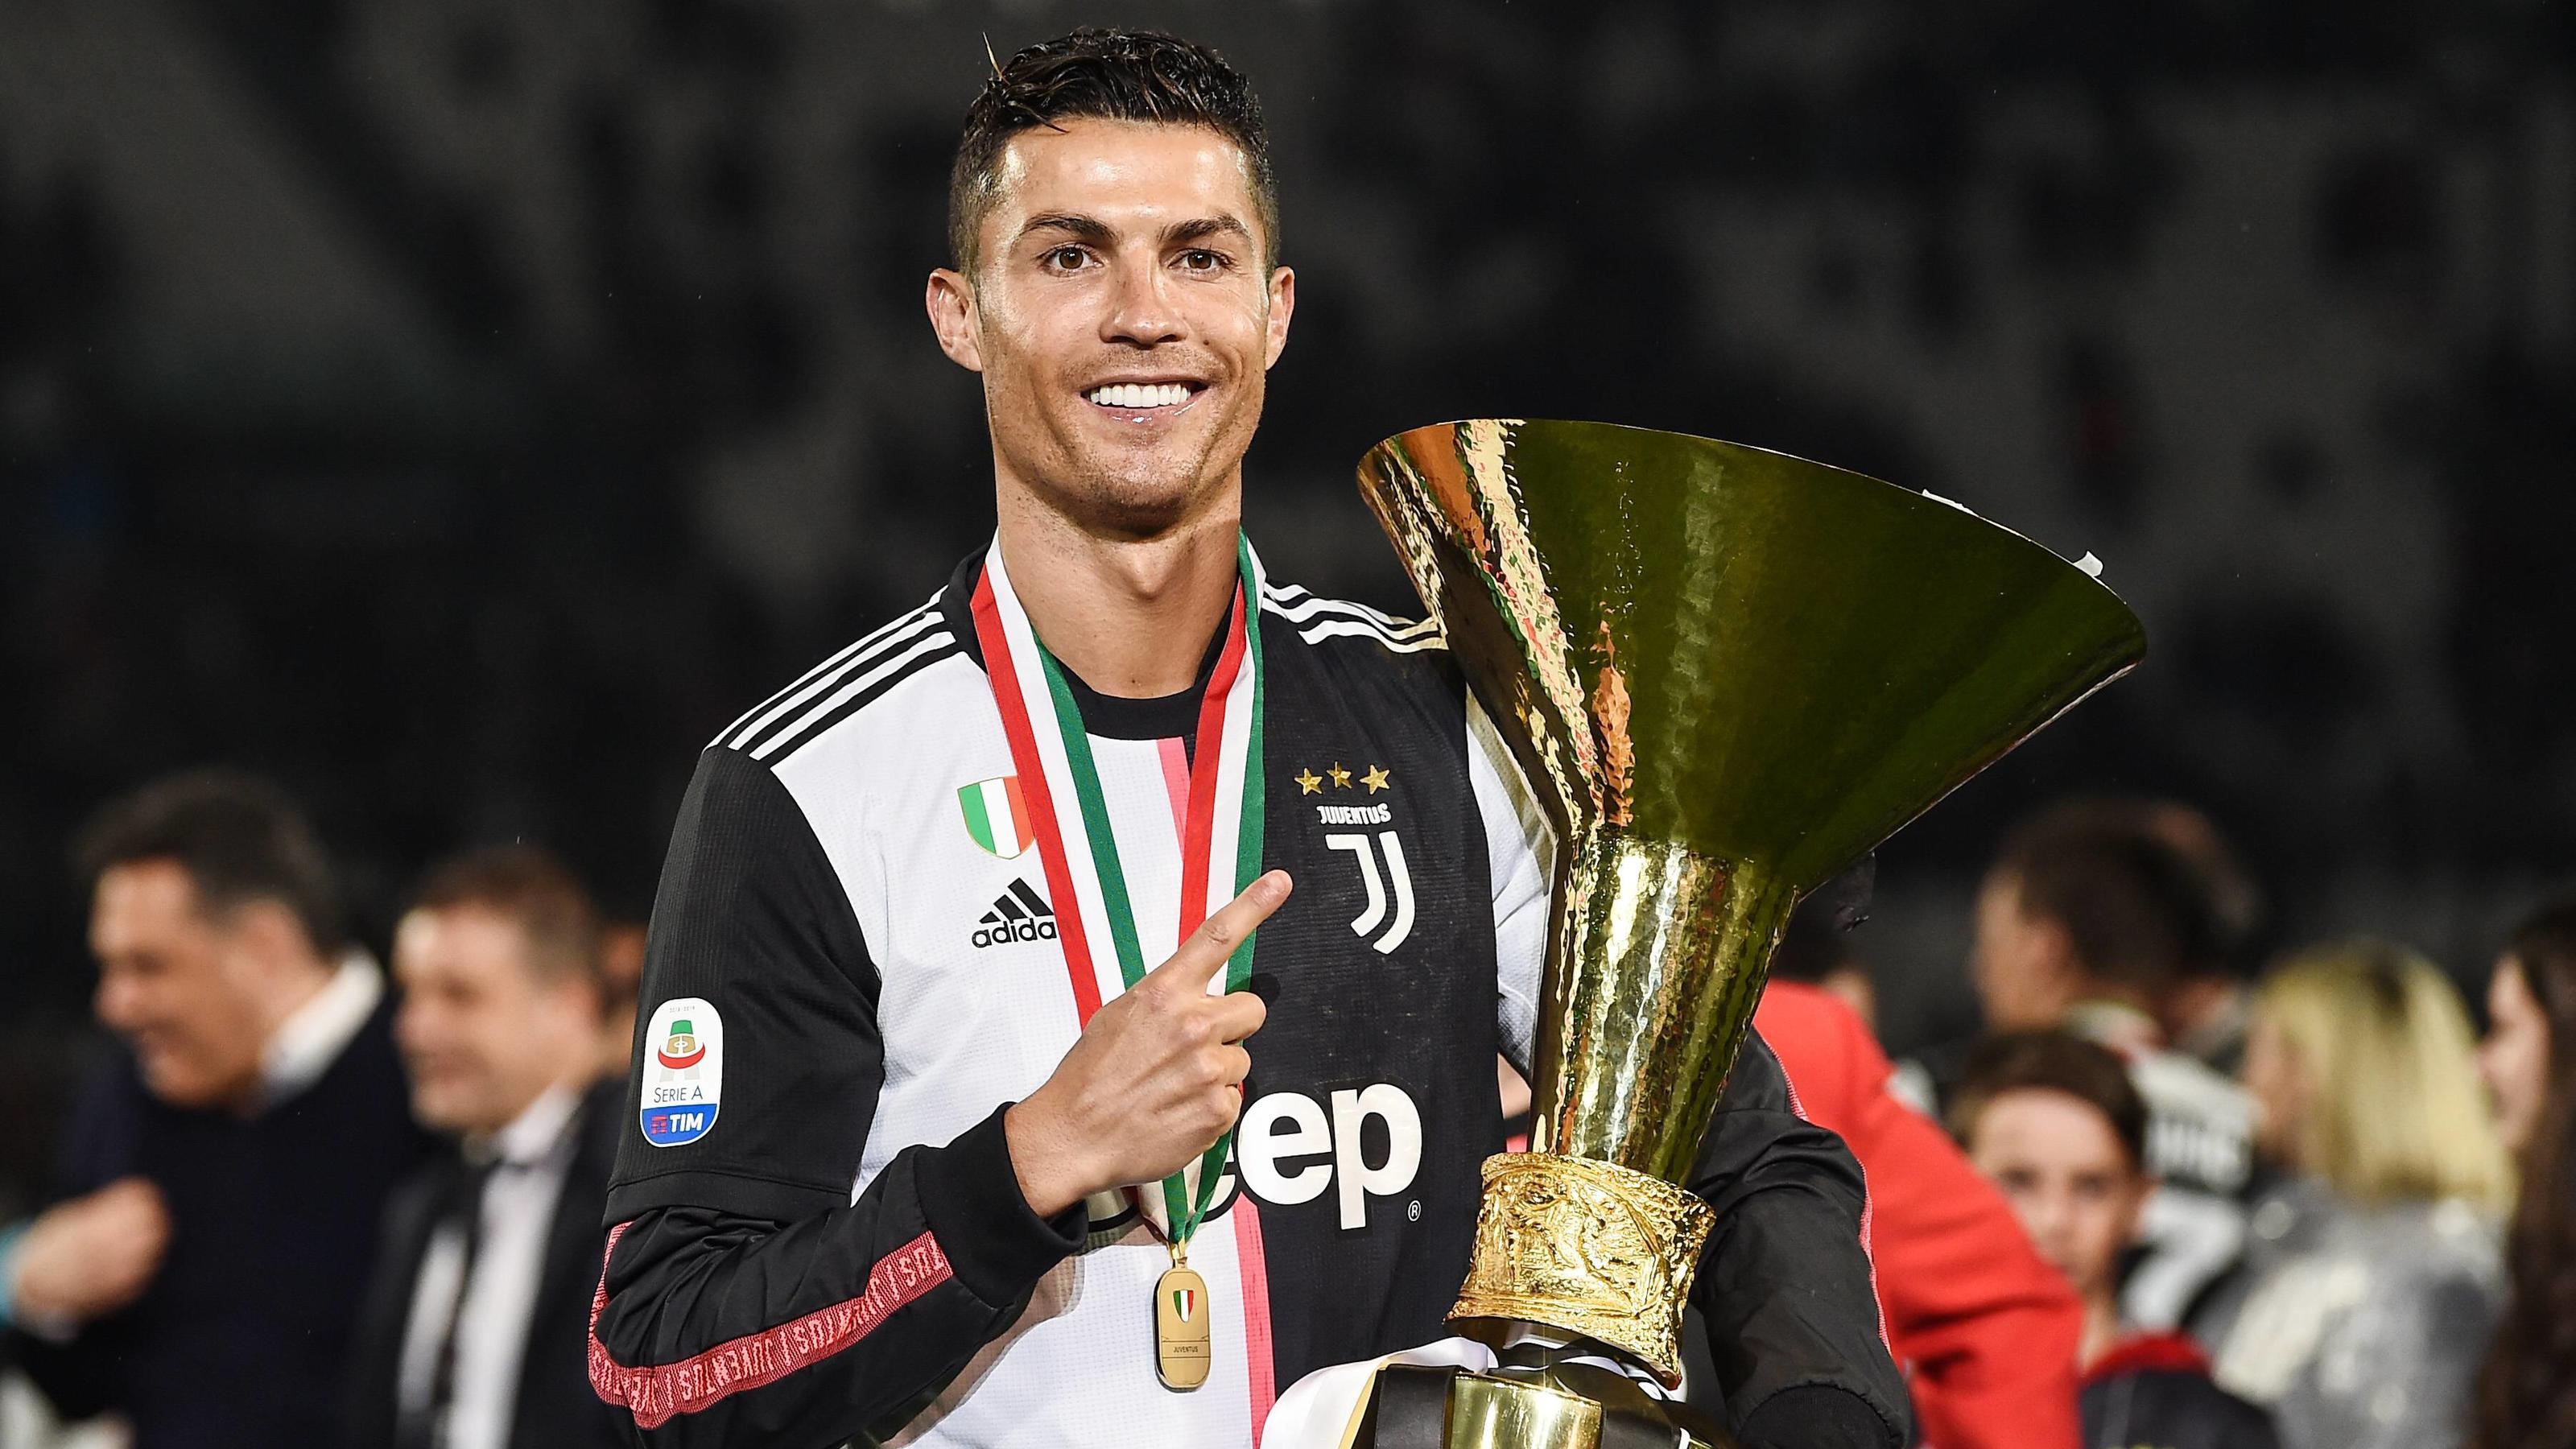 Cristiano Ronaldo Kippt Meister Pokal Um Und Trifft Sohn